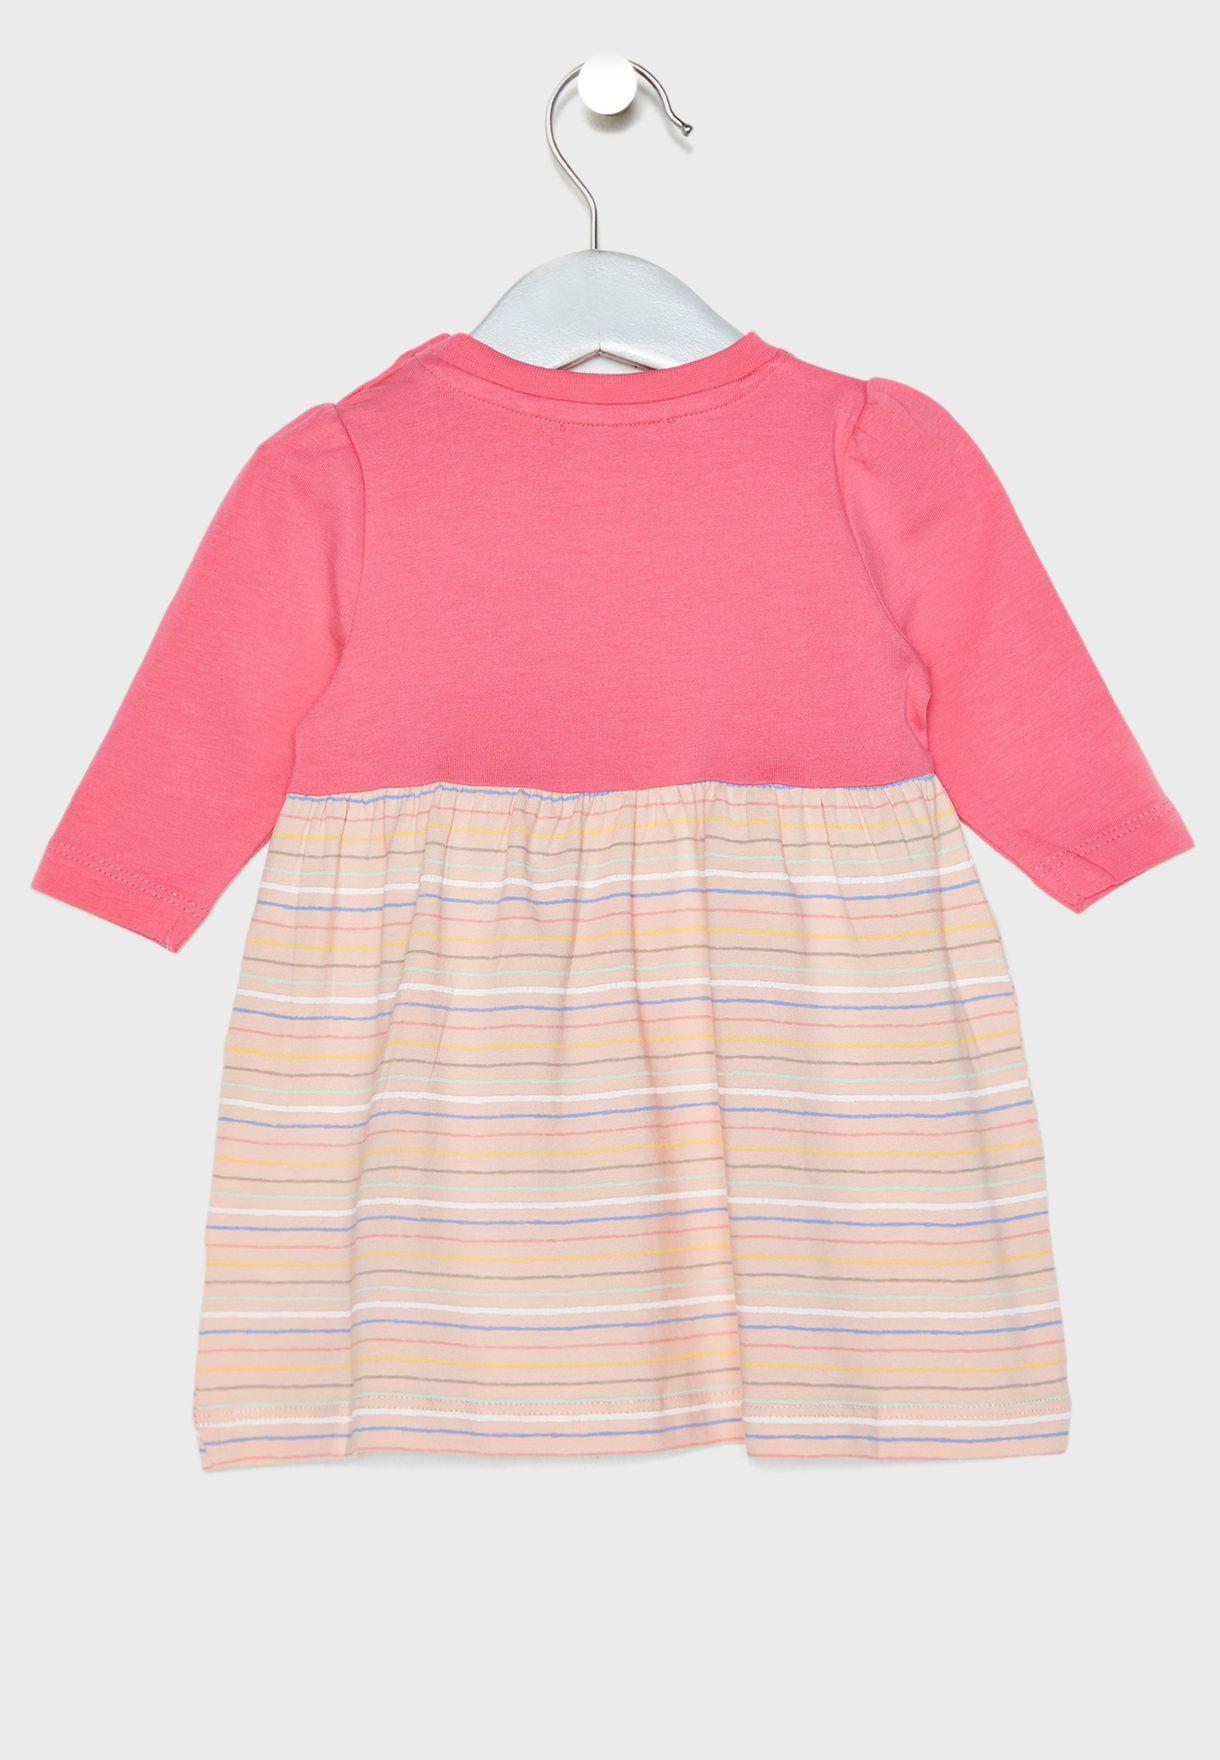 Infant Pinted Dress